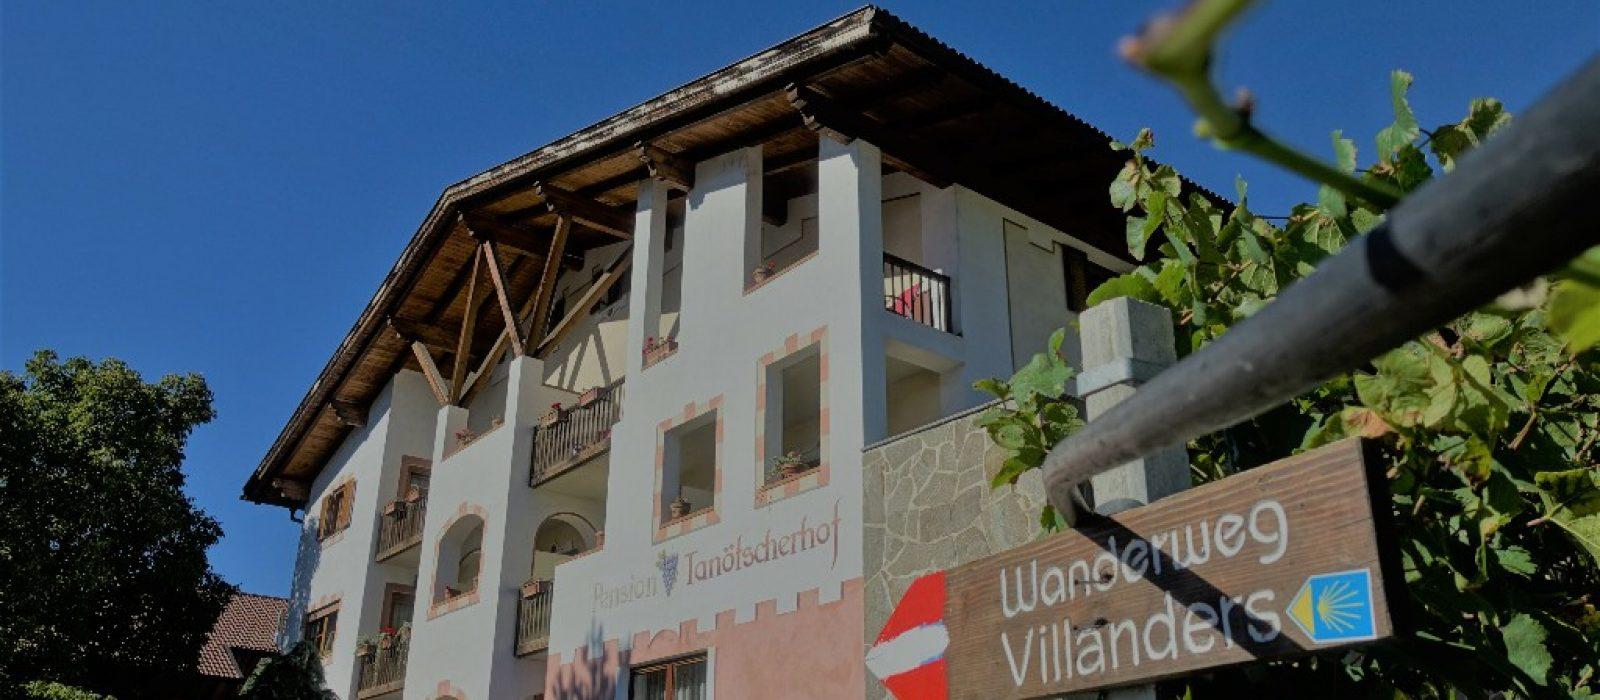 Tanoetscherhof (9)